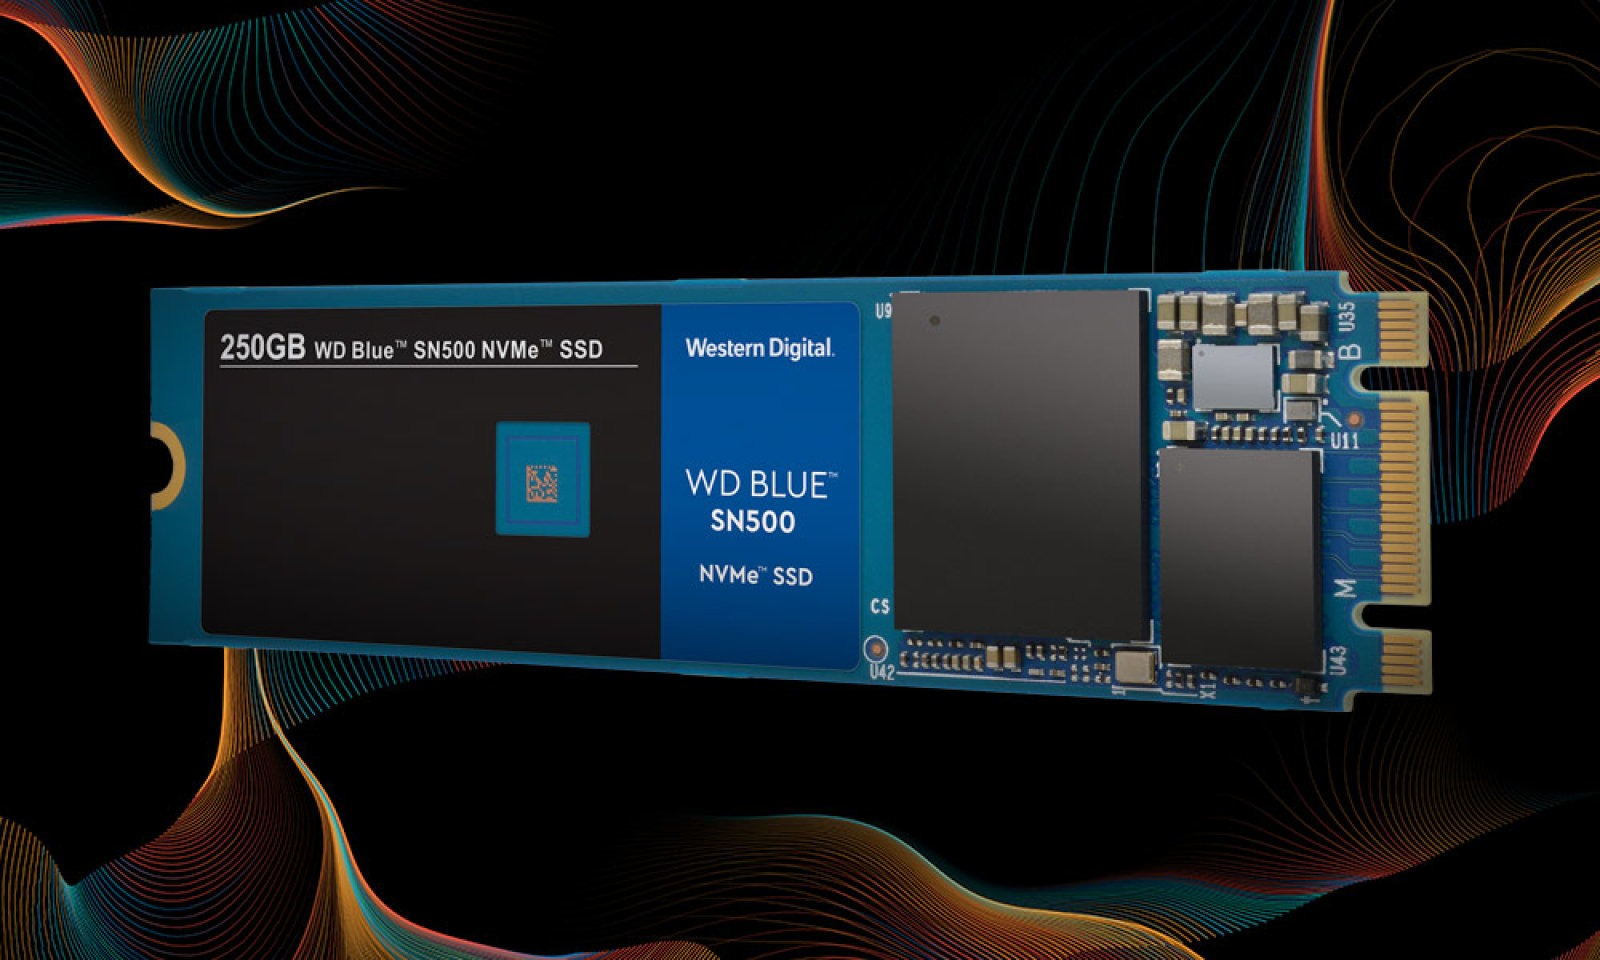 SSD NVMe WD Blue SN500